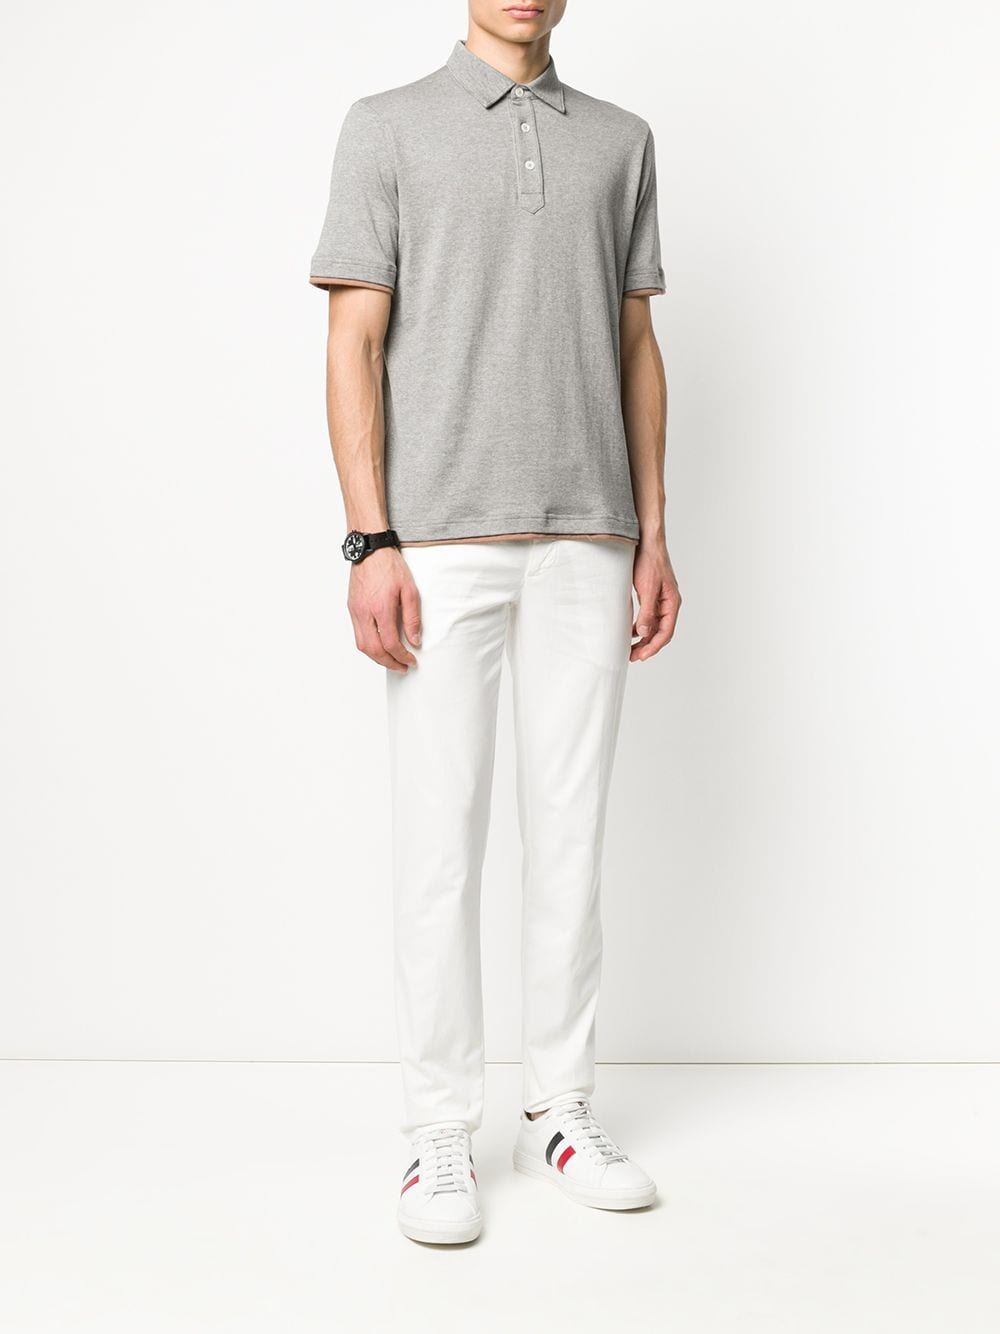 White cotton blend straight-leg low-rise jeans   ELEVENTY |  | A75PANA02-TET0A00301